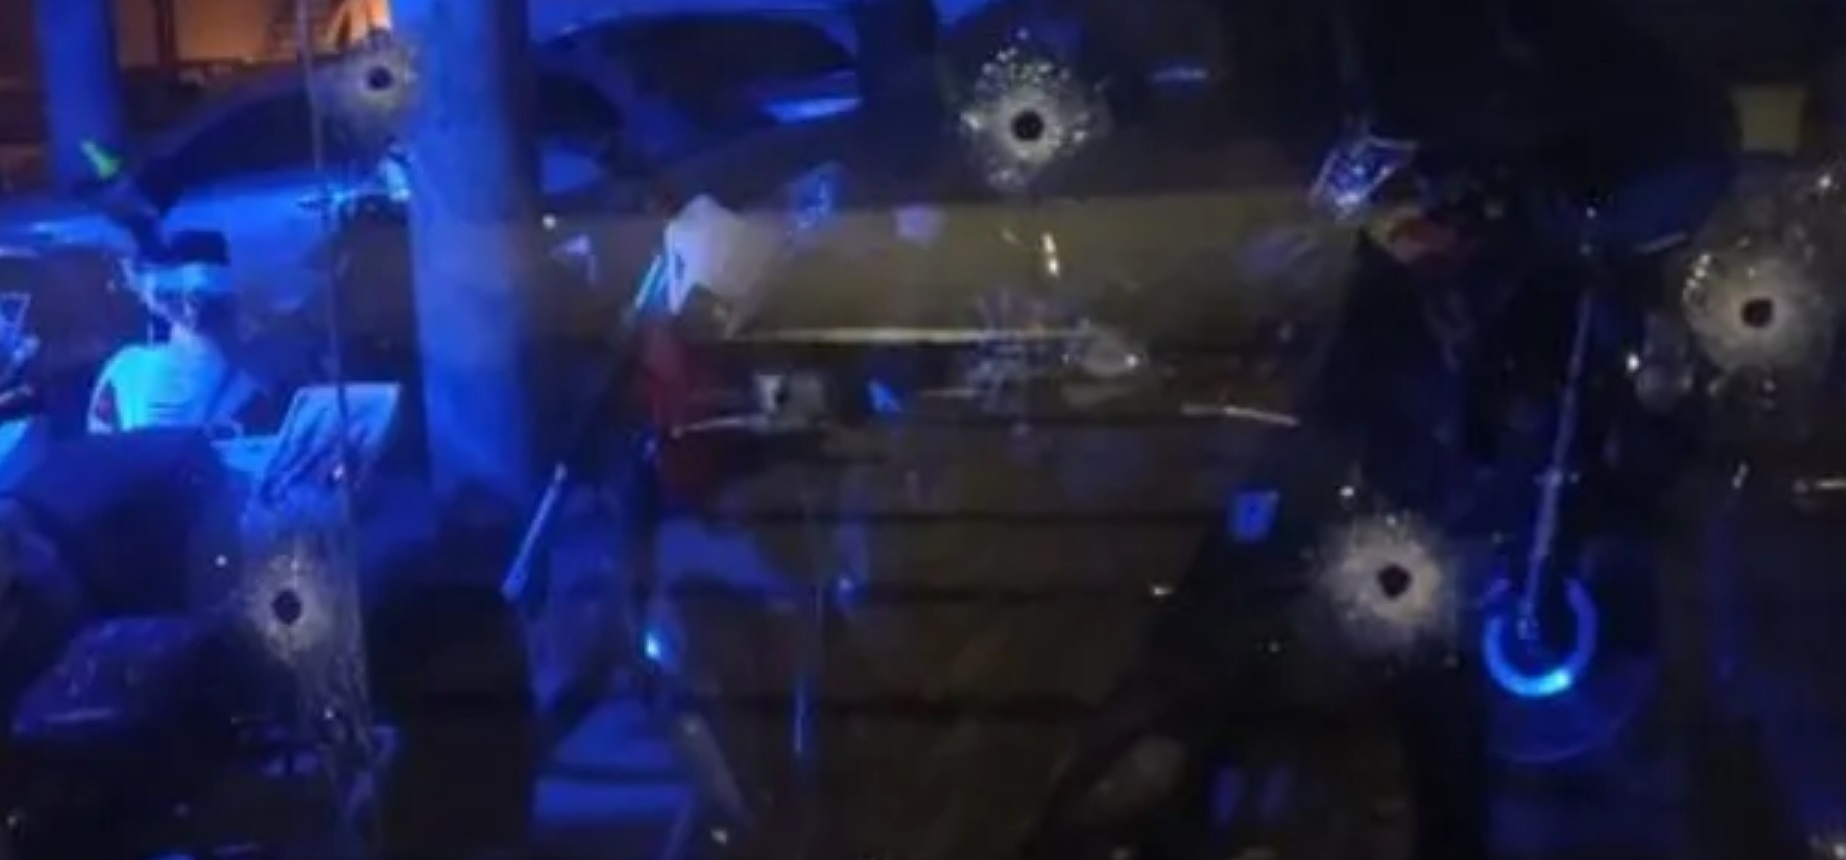 Funes: Dieciséis tiros contra una concesionaria de autos de alta gama